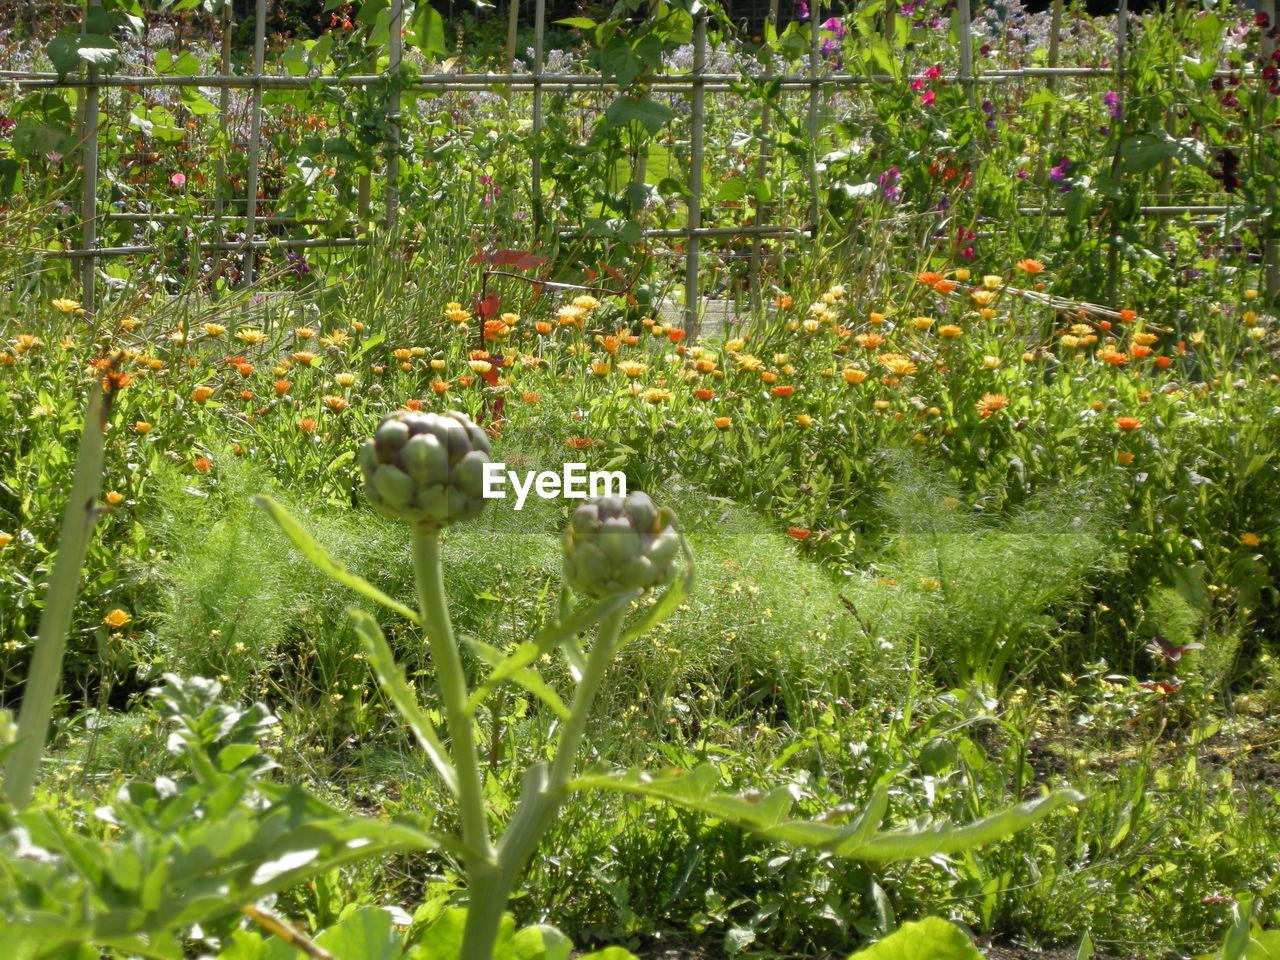 Flowers growing in botanical garden